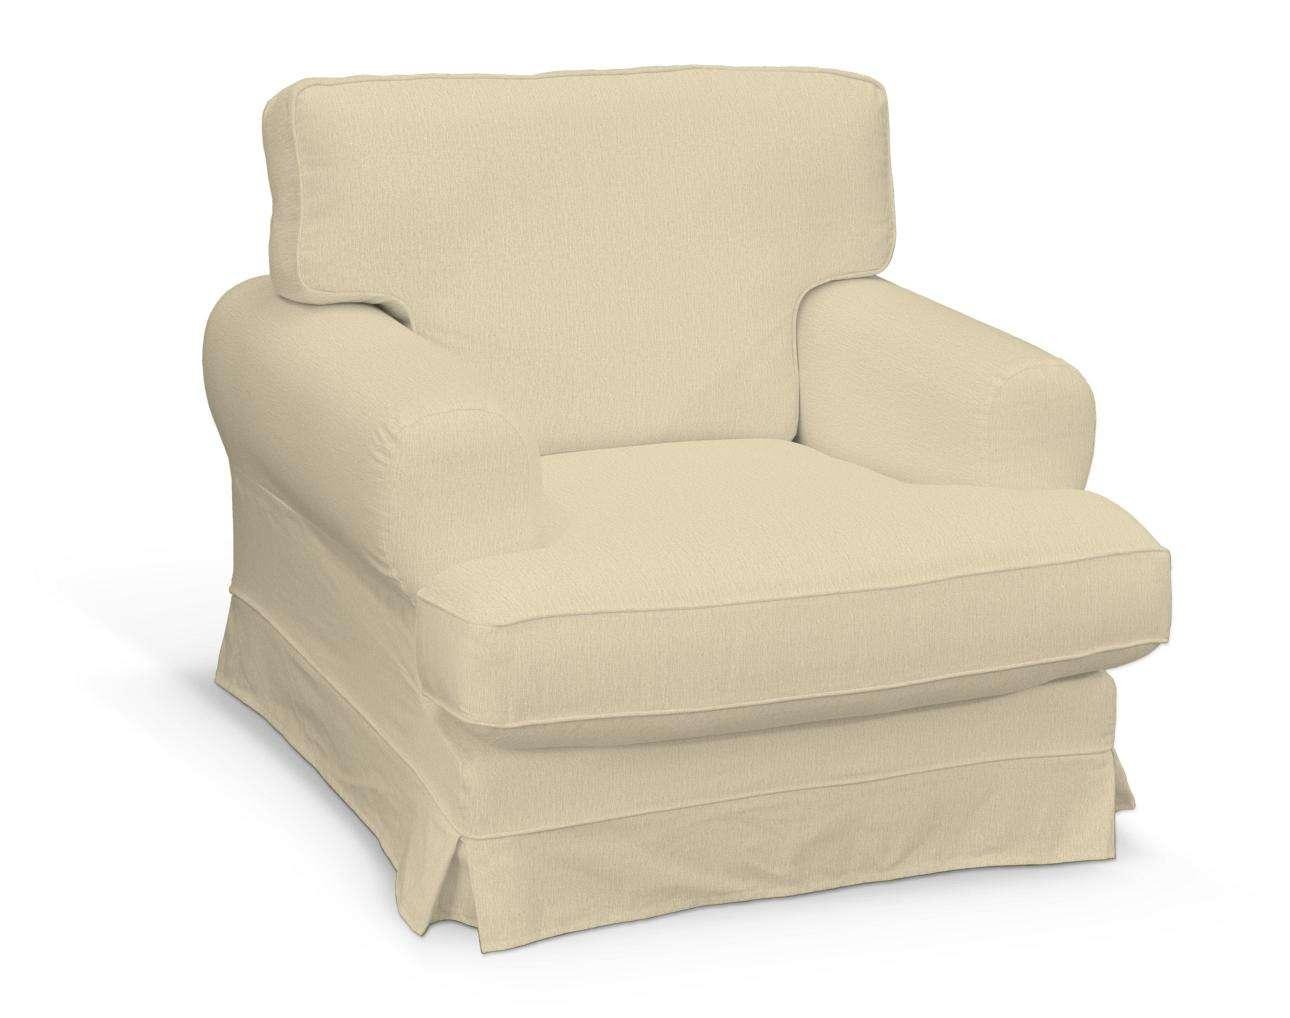 Pokrowiec na fotel Ekeskog Fotel Ekeskog w kolekcji Chenille, tkanina: 702-22